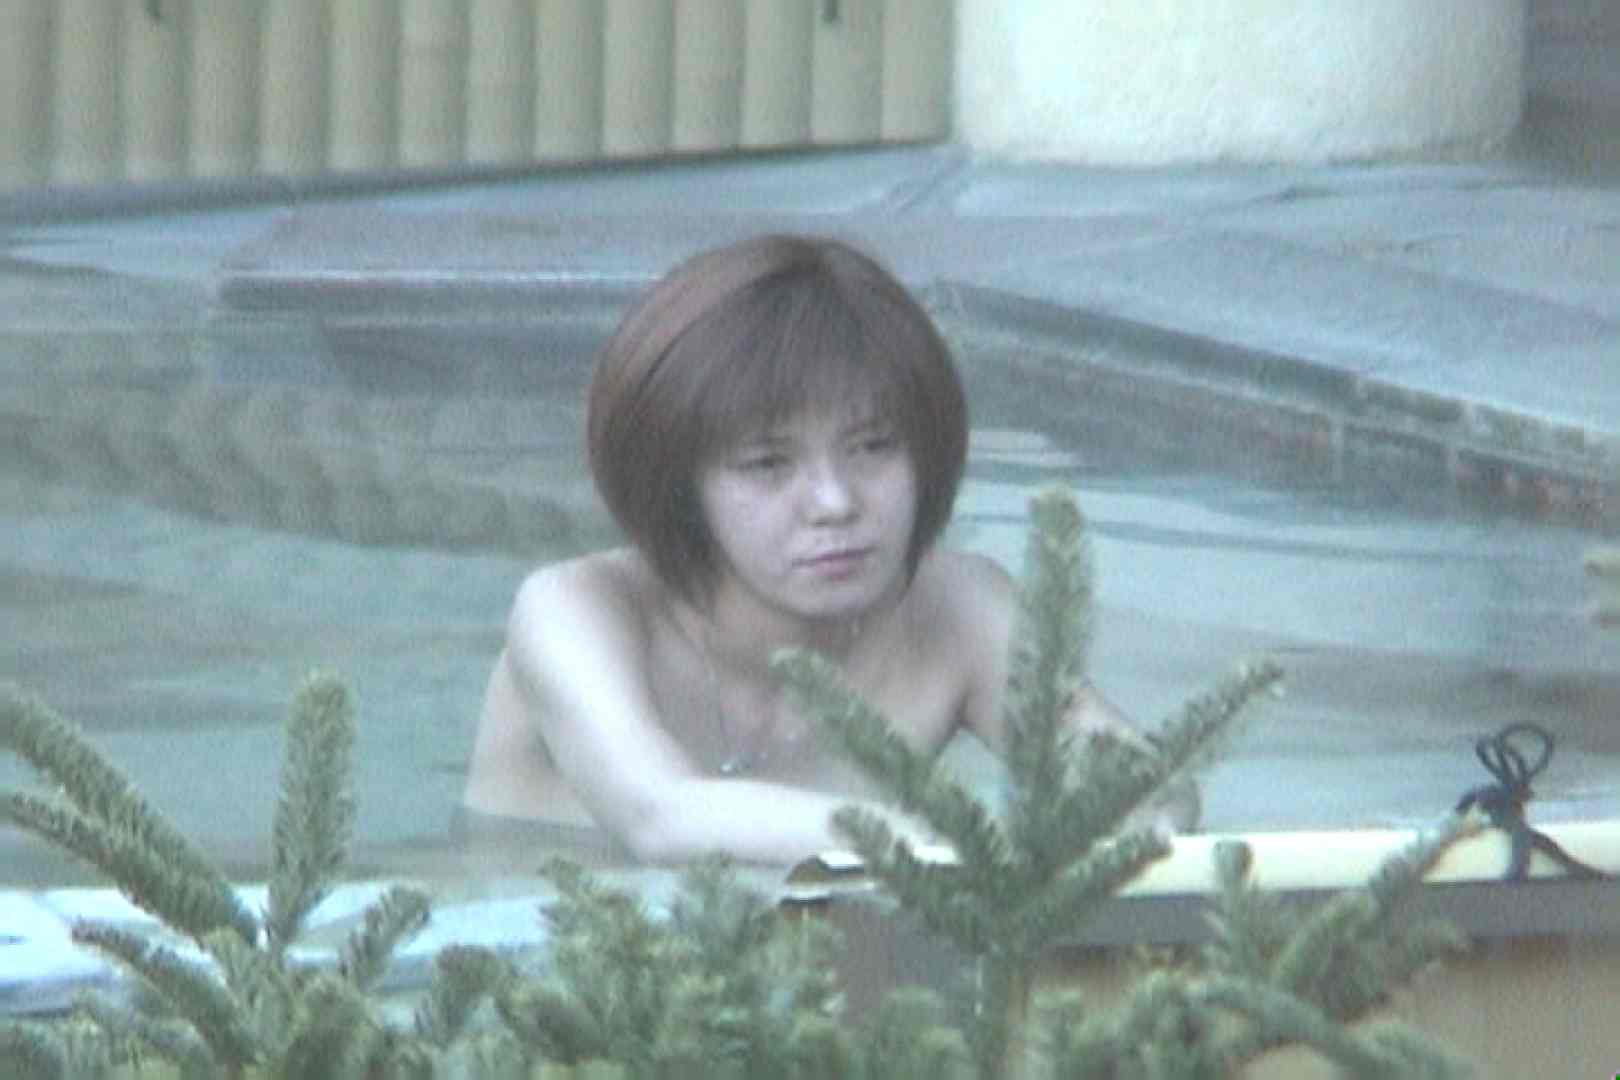 Aquaな露天風呂Vol.560 露天 | HなOL  62pic 53